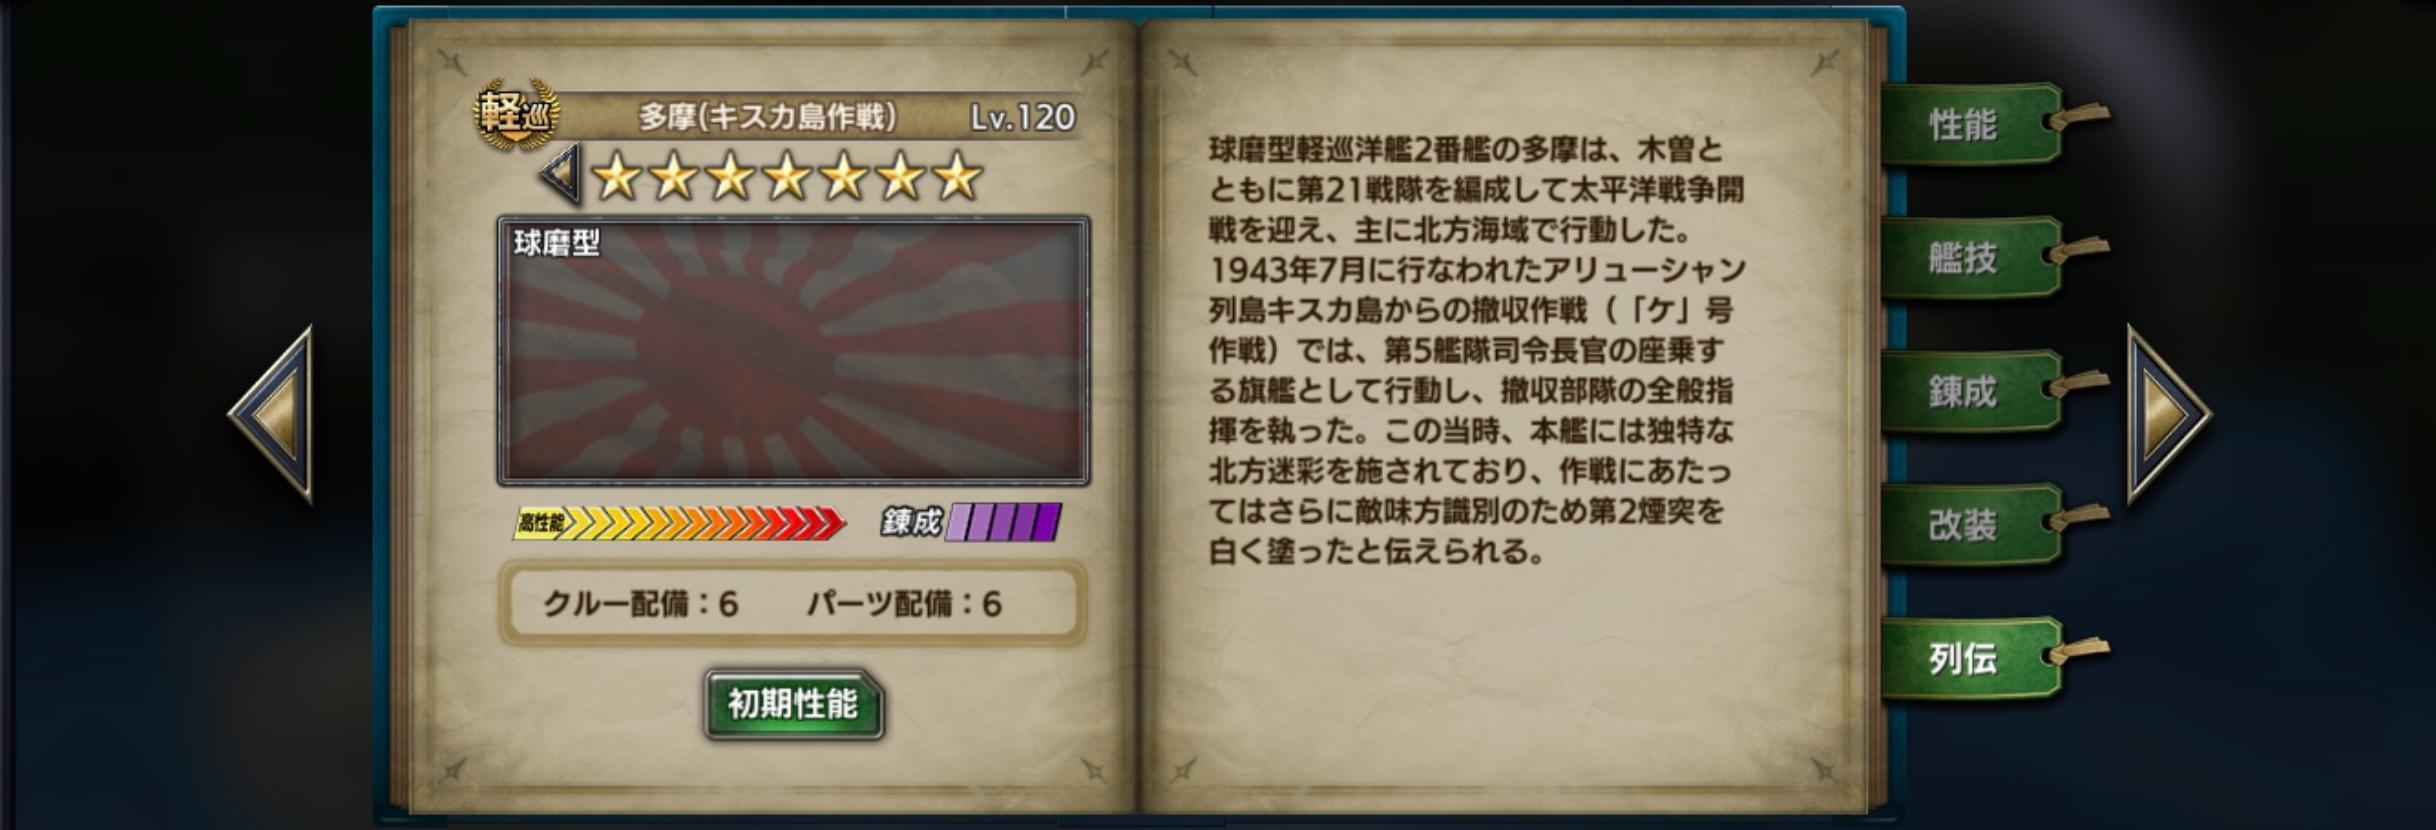 TamaK-history